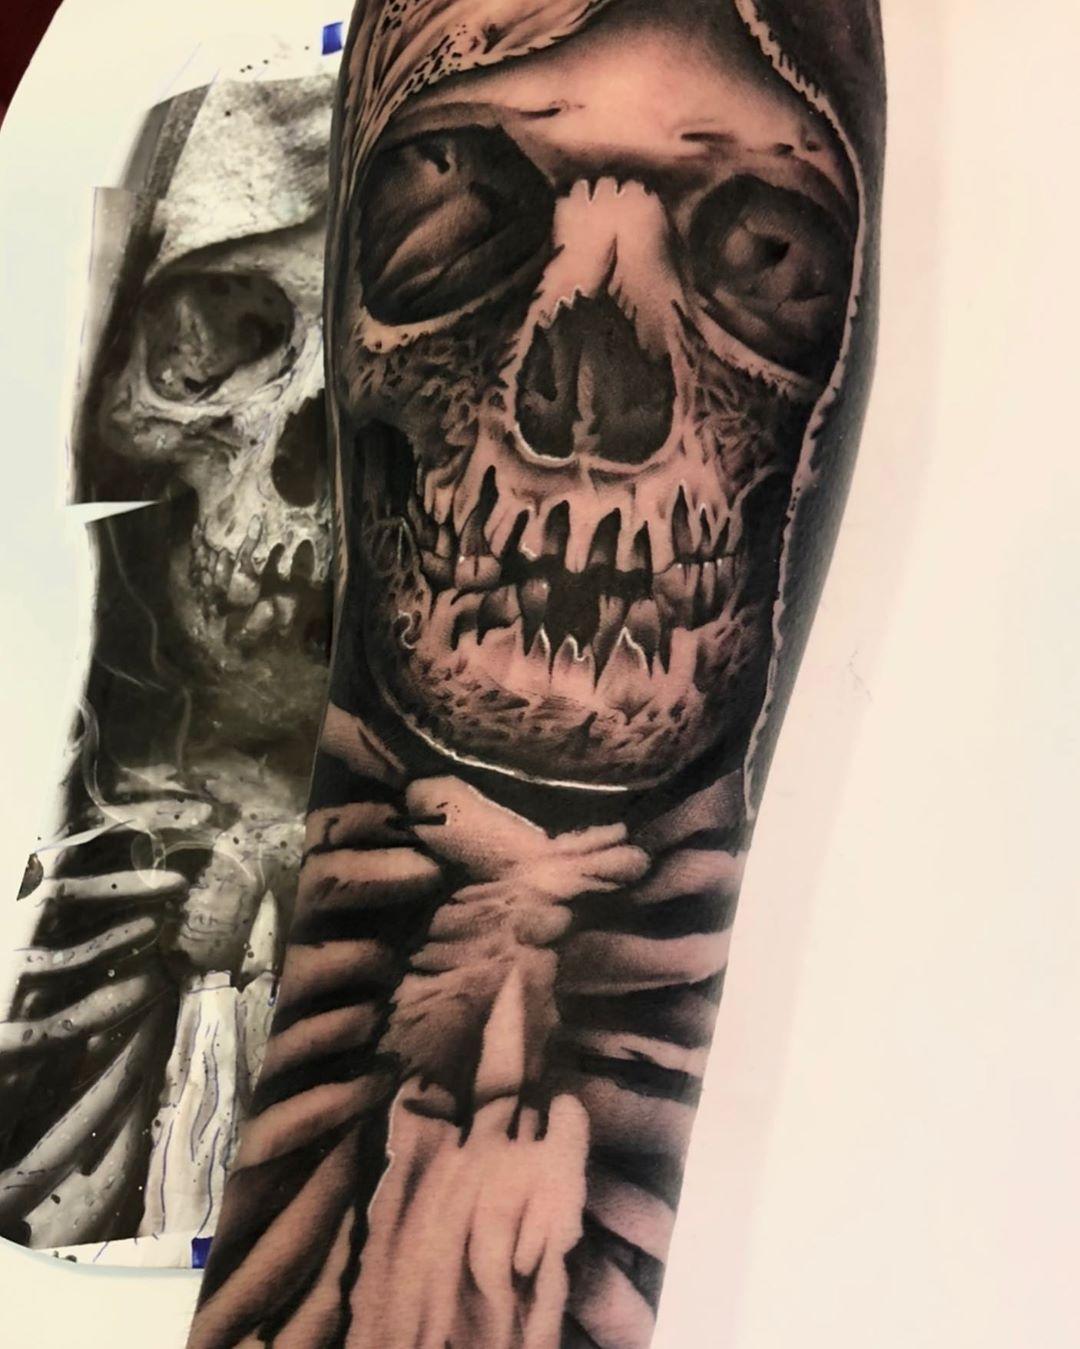 followmeciudadreal,ciudadreal,tomelloso,almagro,puertollano,tatuajesenpuertollano,tatuajesendaimiel,ciudadrealtattoo,ciudadrealtatuajes,tatuajesciudadreal,follow,ciudadrealtatuajes,puertollano,tattooers,besttattooers,juantabasco,ciudadrealsetatua,ink,tatuajes,realiismo,realistictattoo,ciudadrealtattoo,tatuajesenpuertollano,traditionaltattoos,castillalamancha